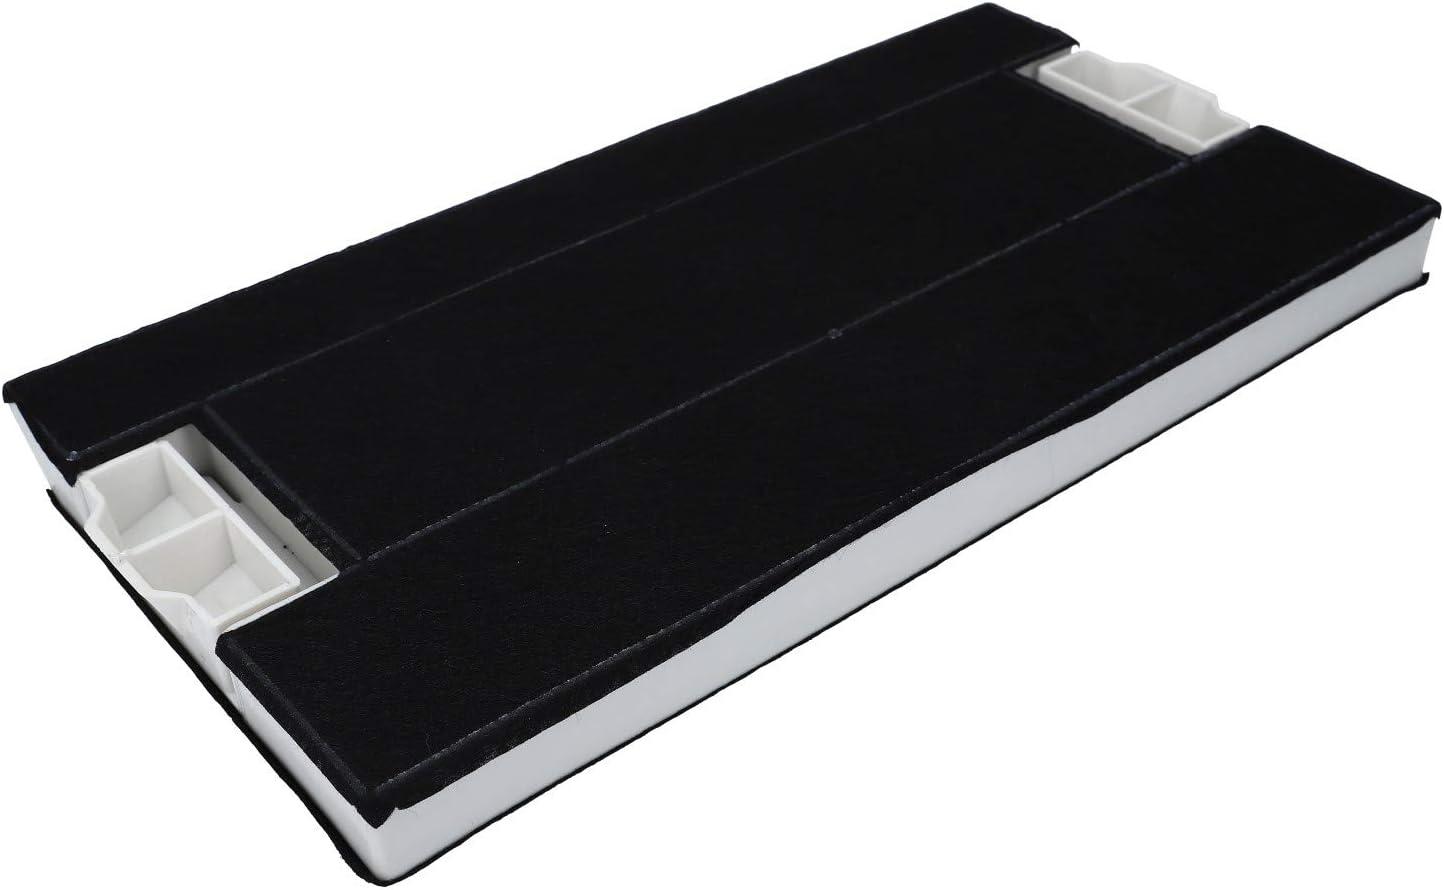 DL-pro Filtro de carbón para campana extractora Bosch Siemens Neff Balay Gaggenau Küppersbusch 00434229 434229 DHZ4506 LZ45501 Z5144X1